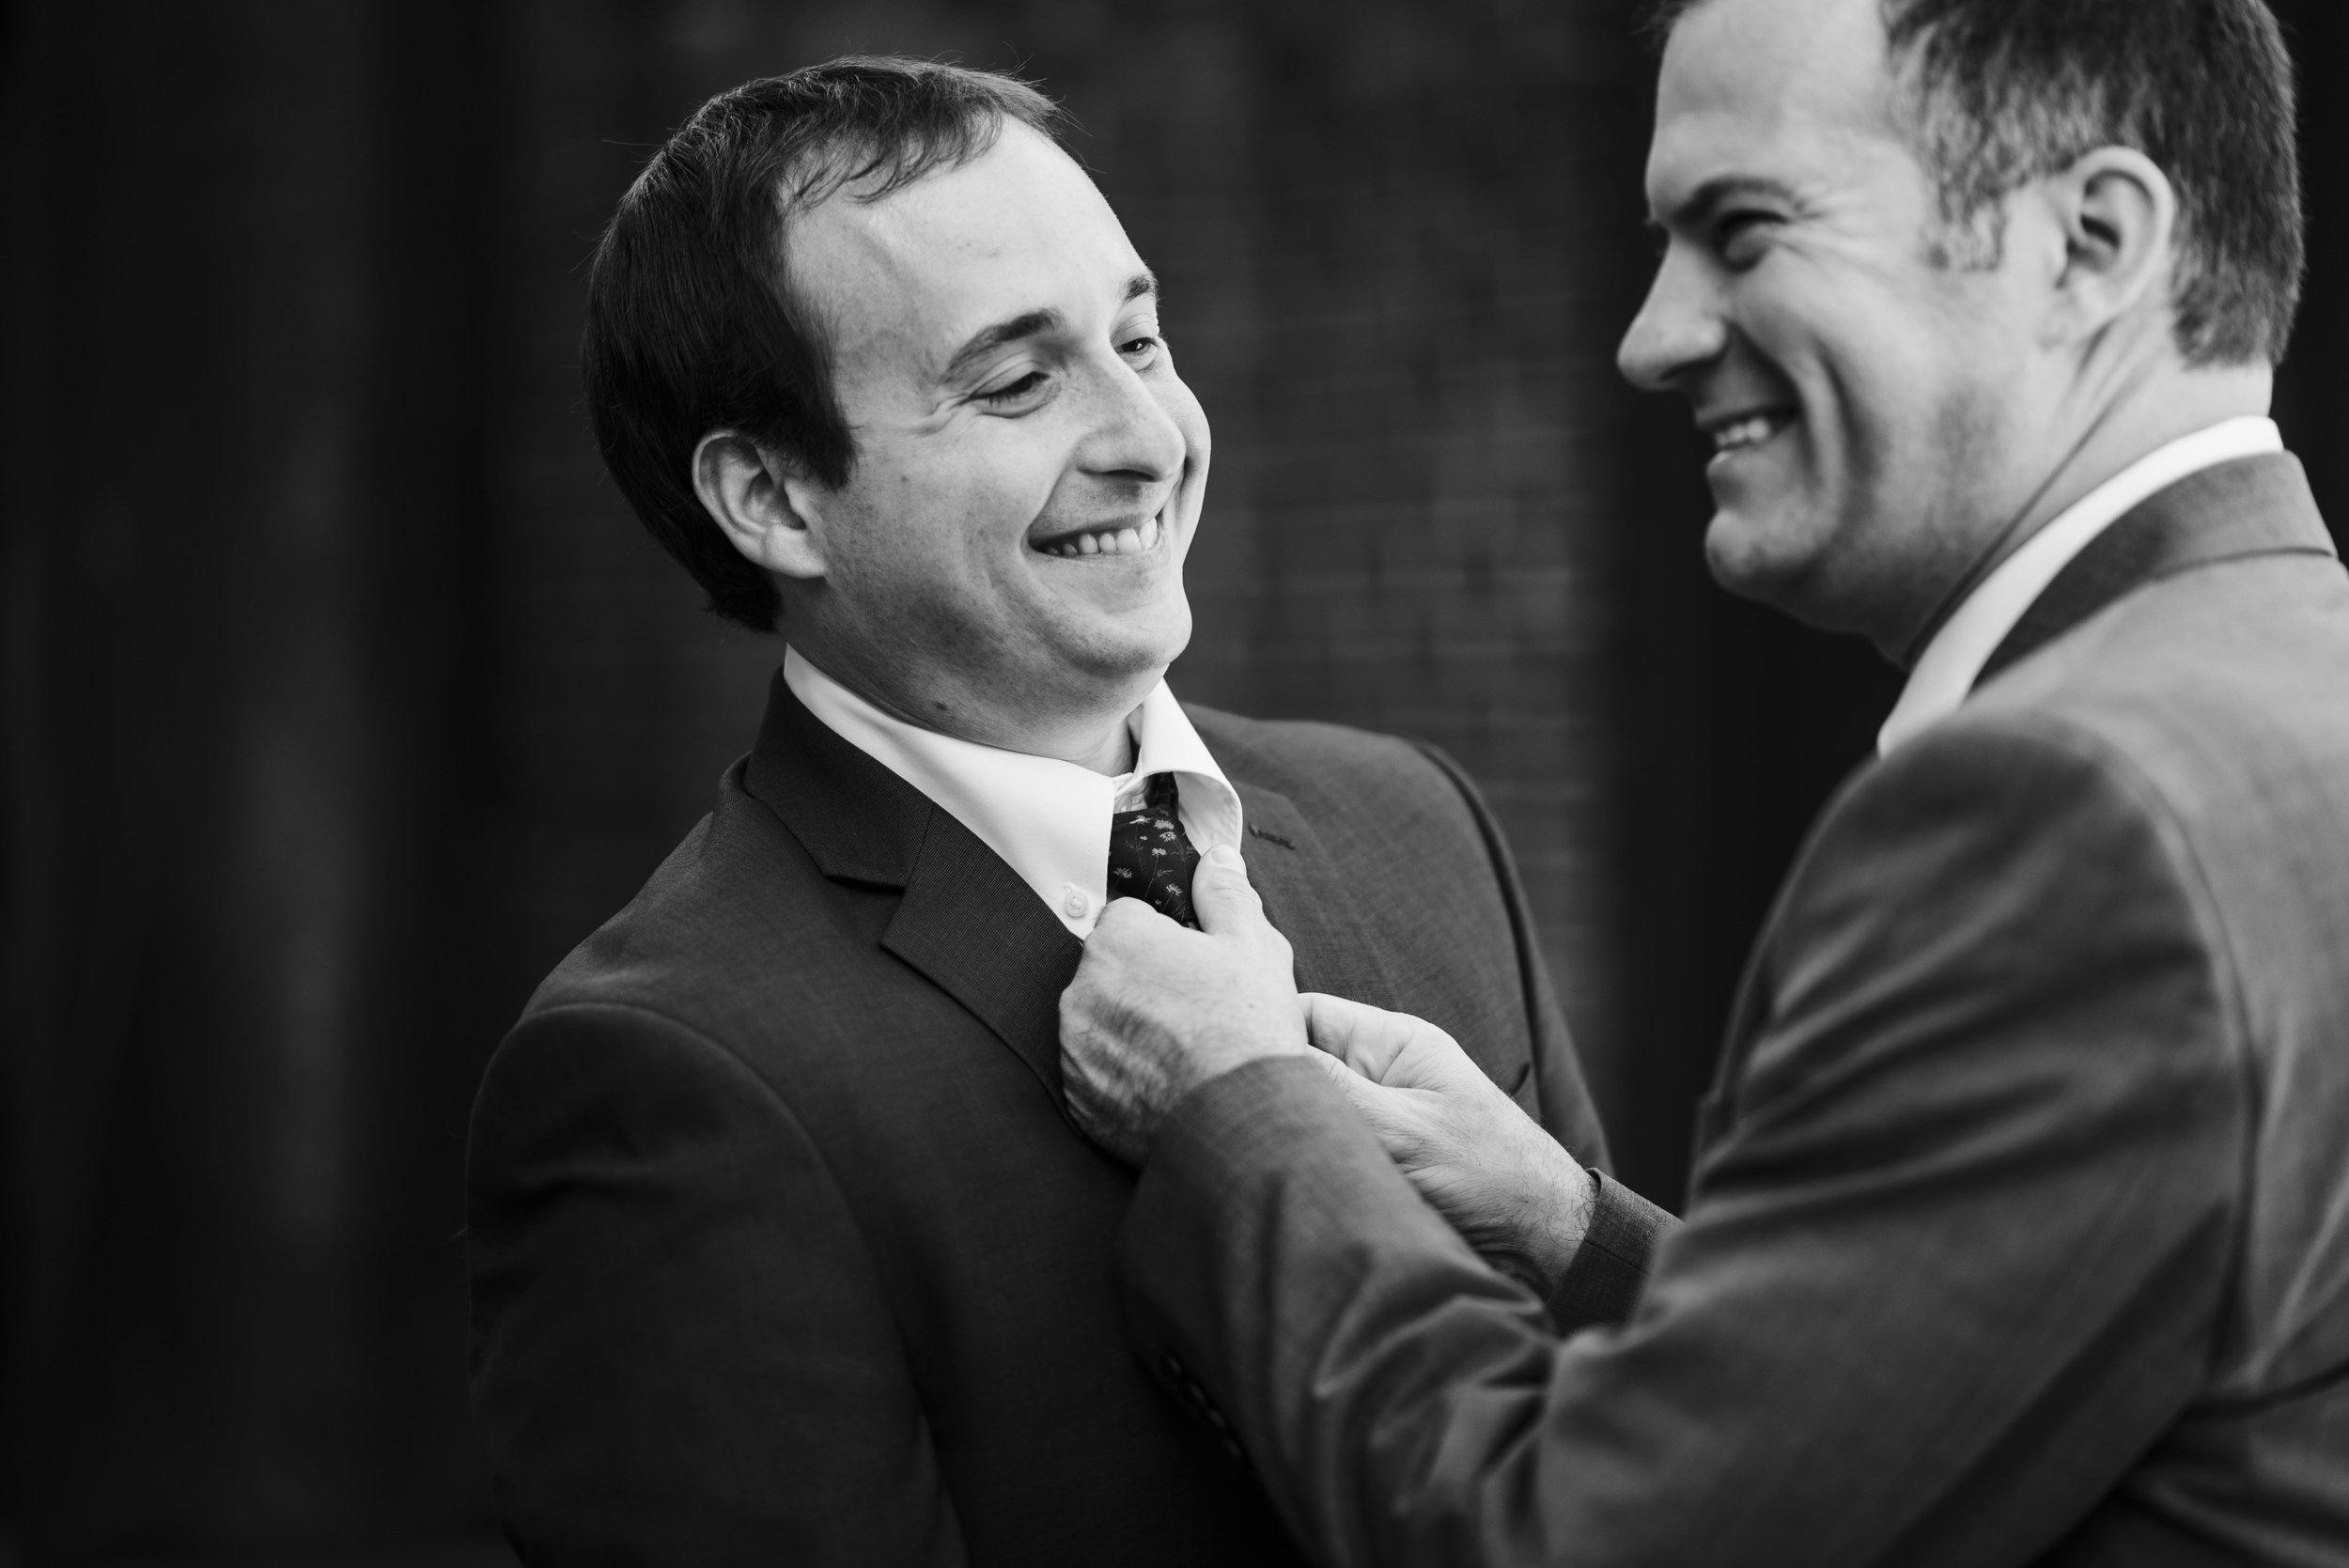 groom tie graduate Athens